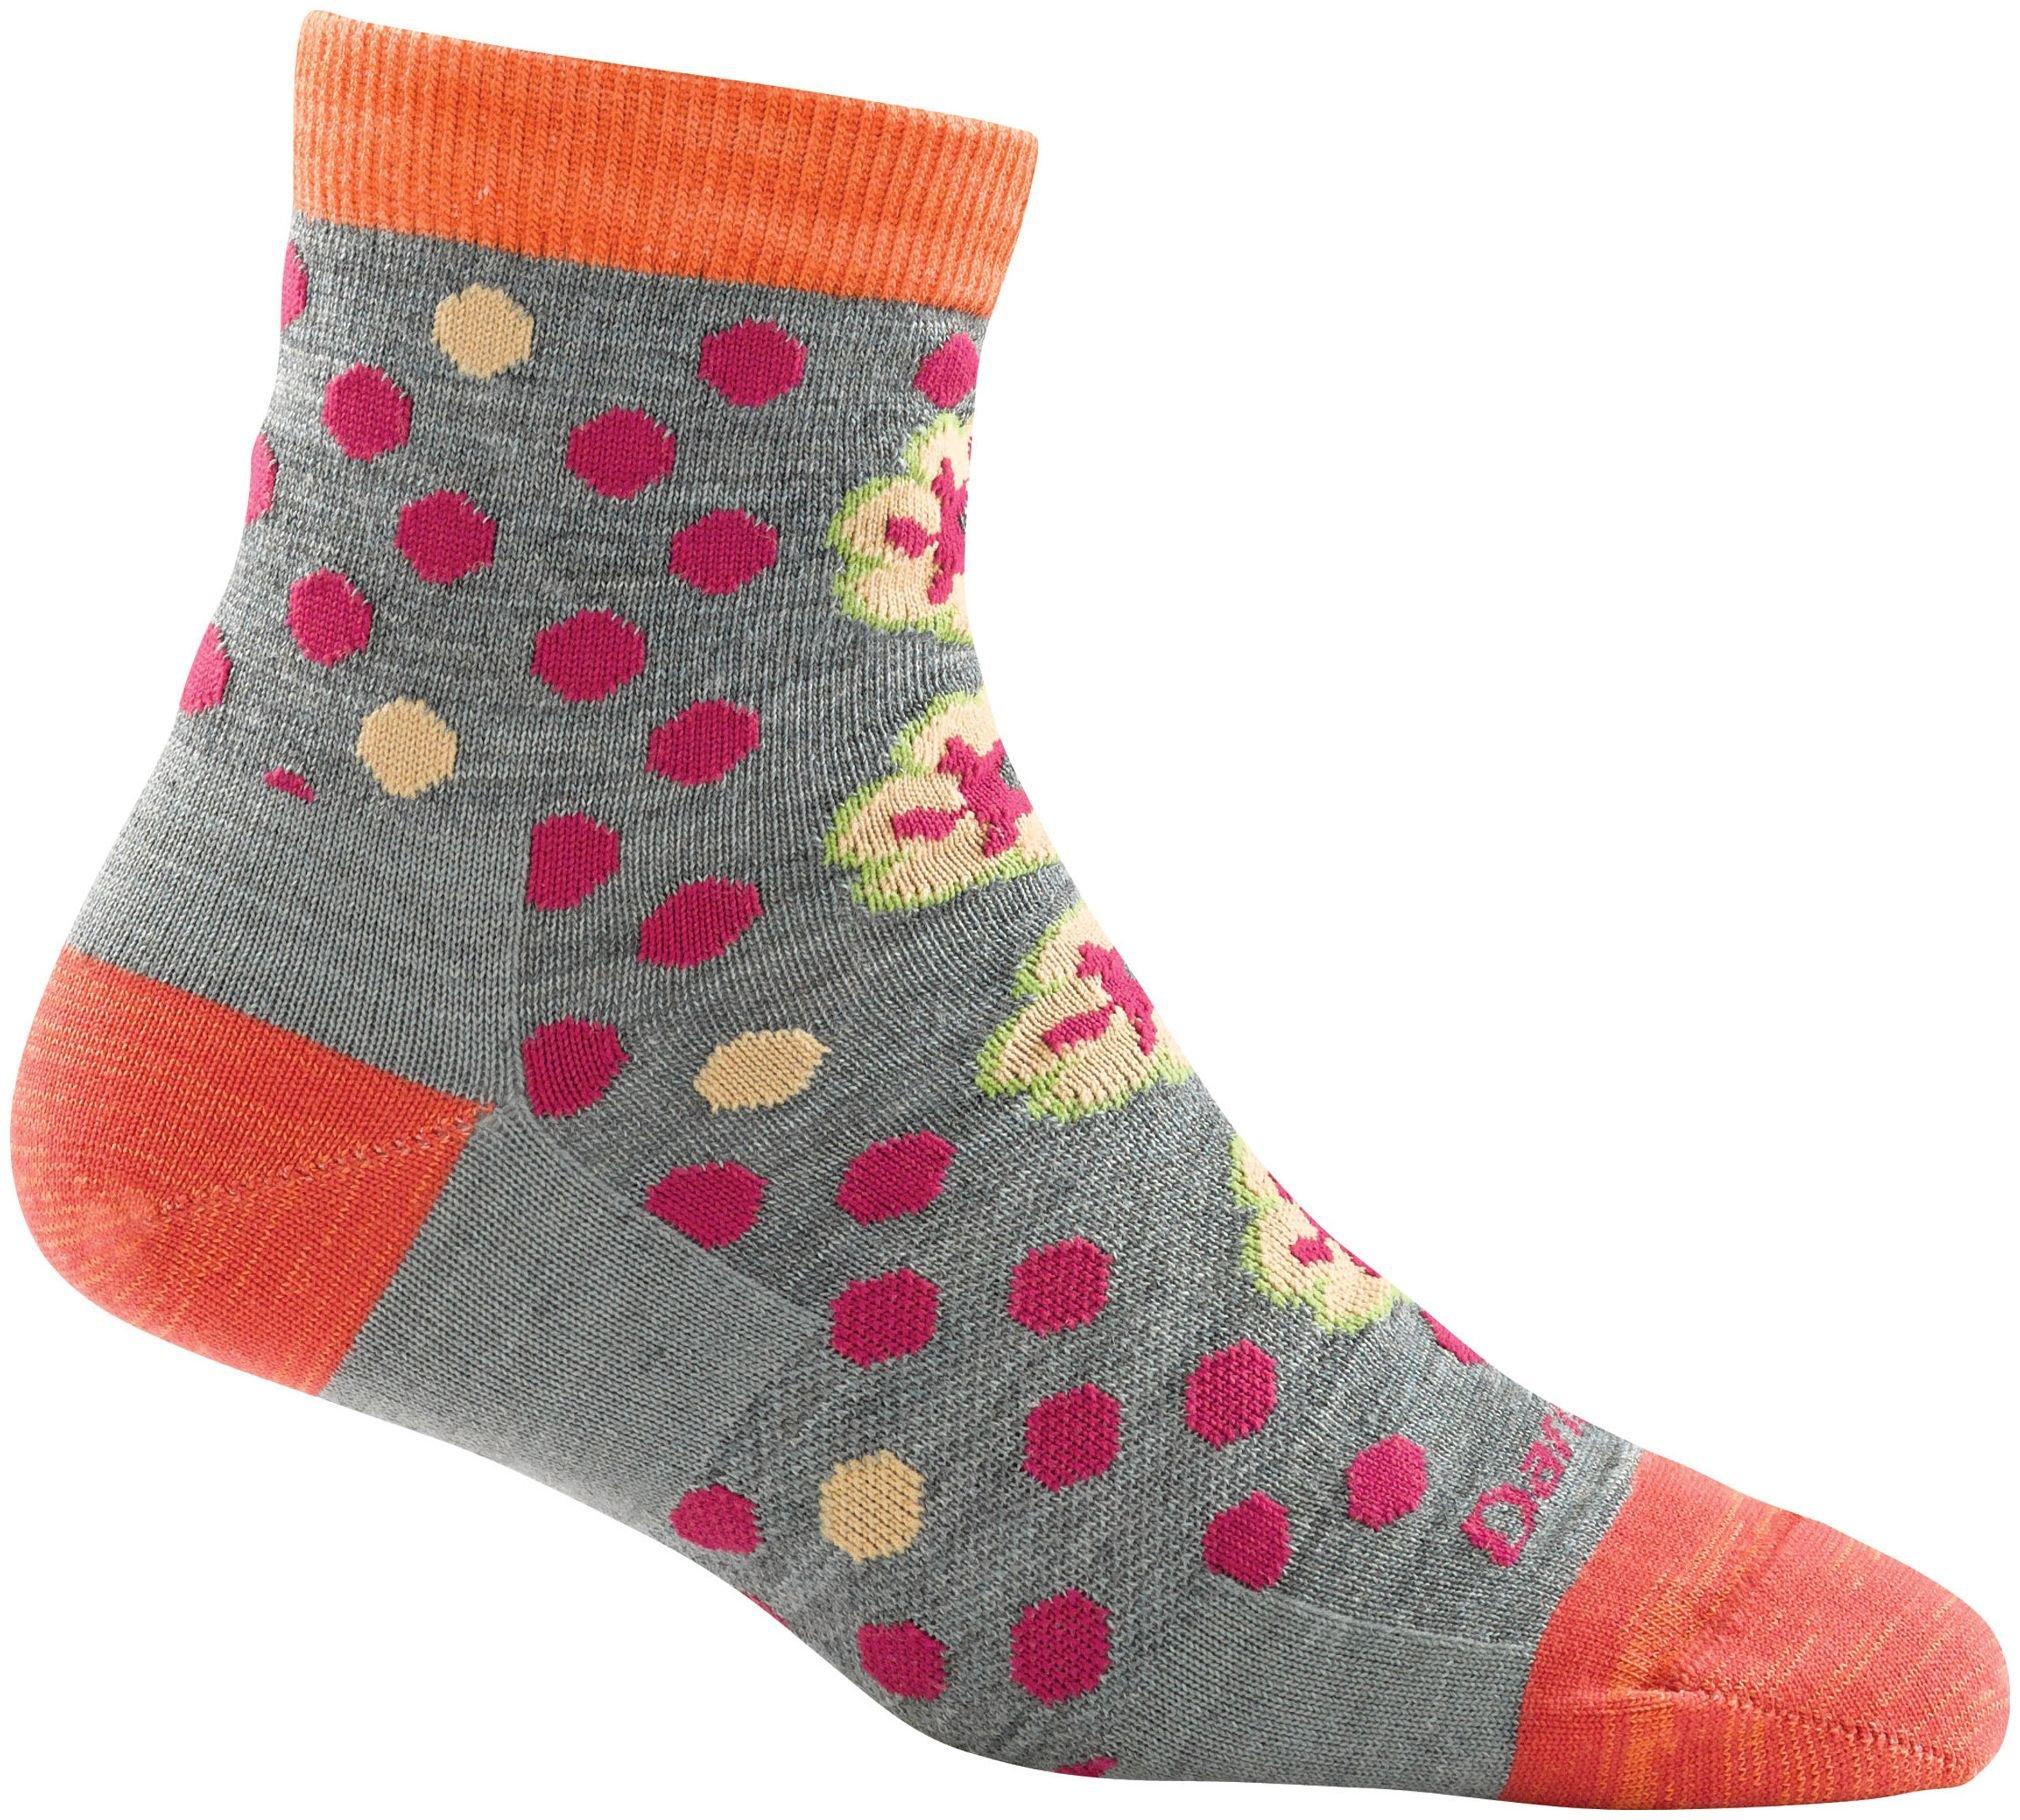 Darn Tough Women's Merino Wool Flower Power Shorty Light Socks Medium Sea Foam DISCONTINUED